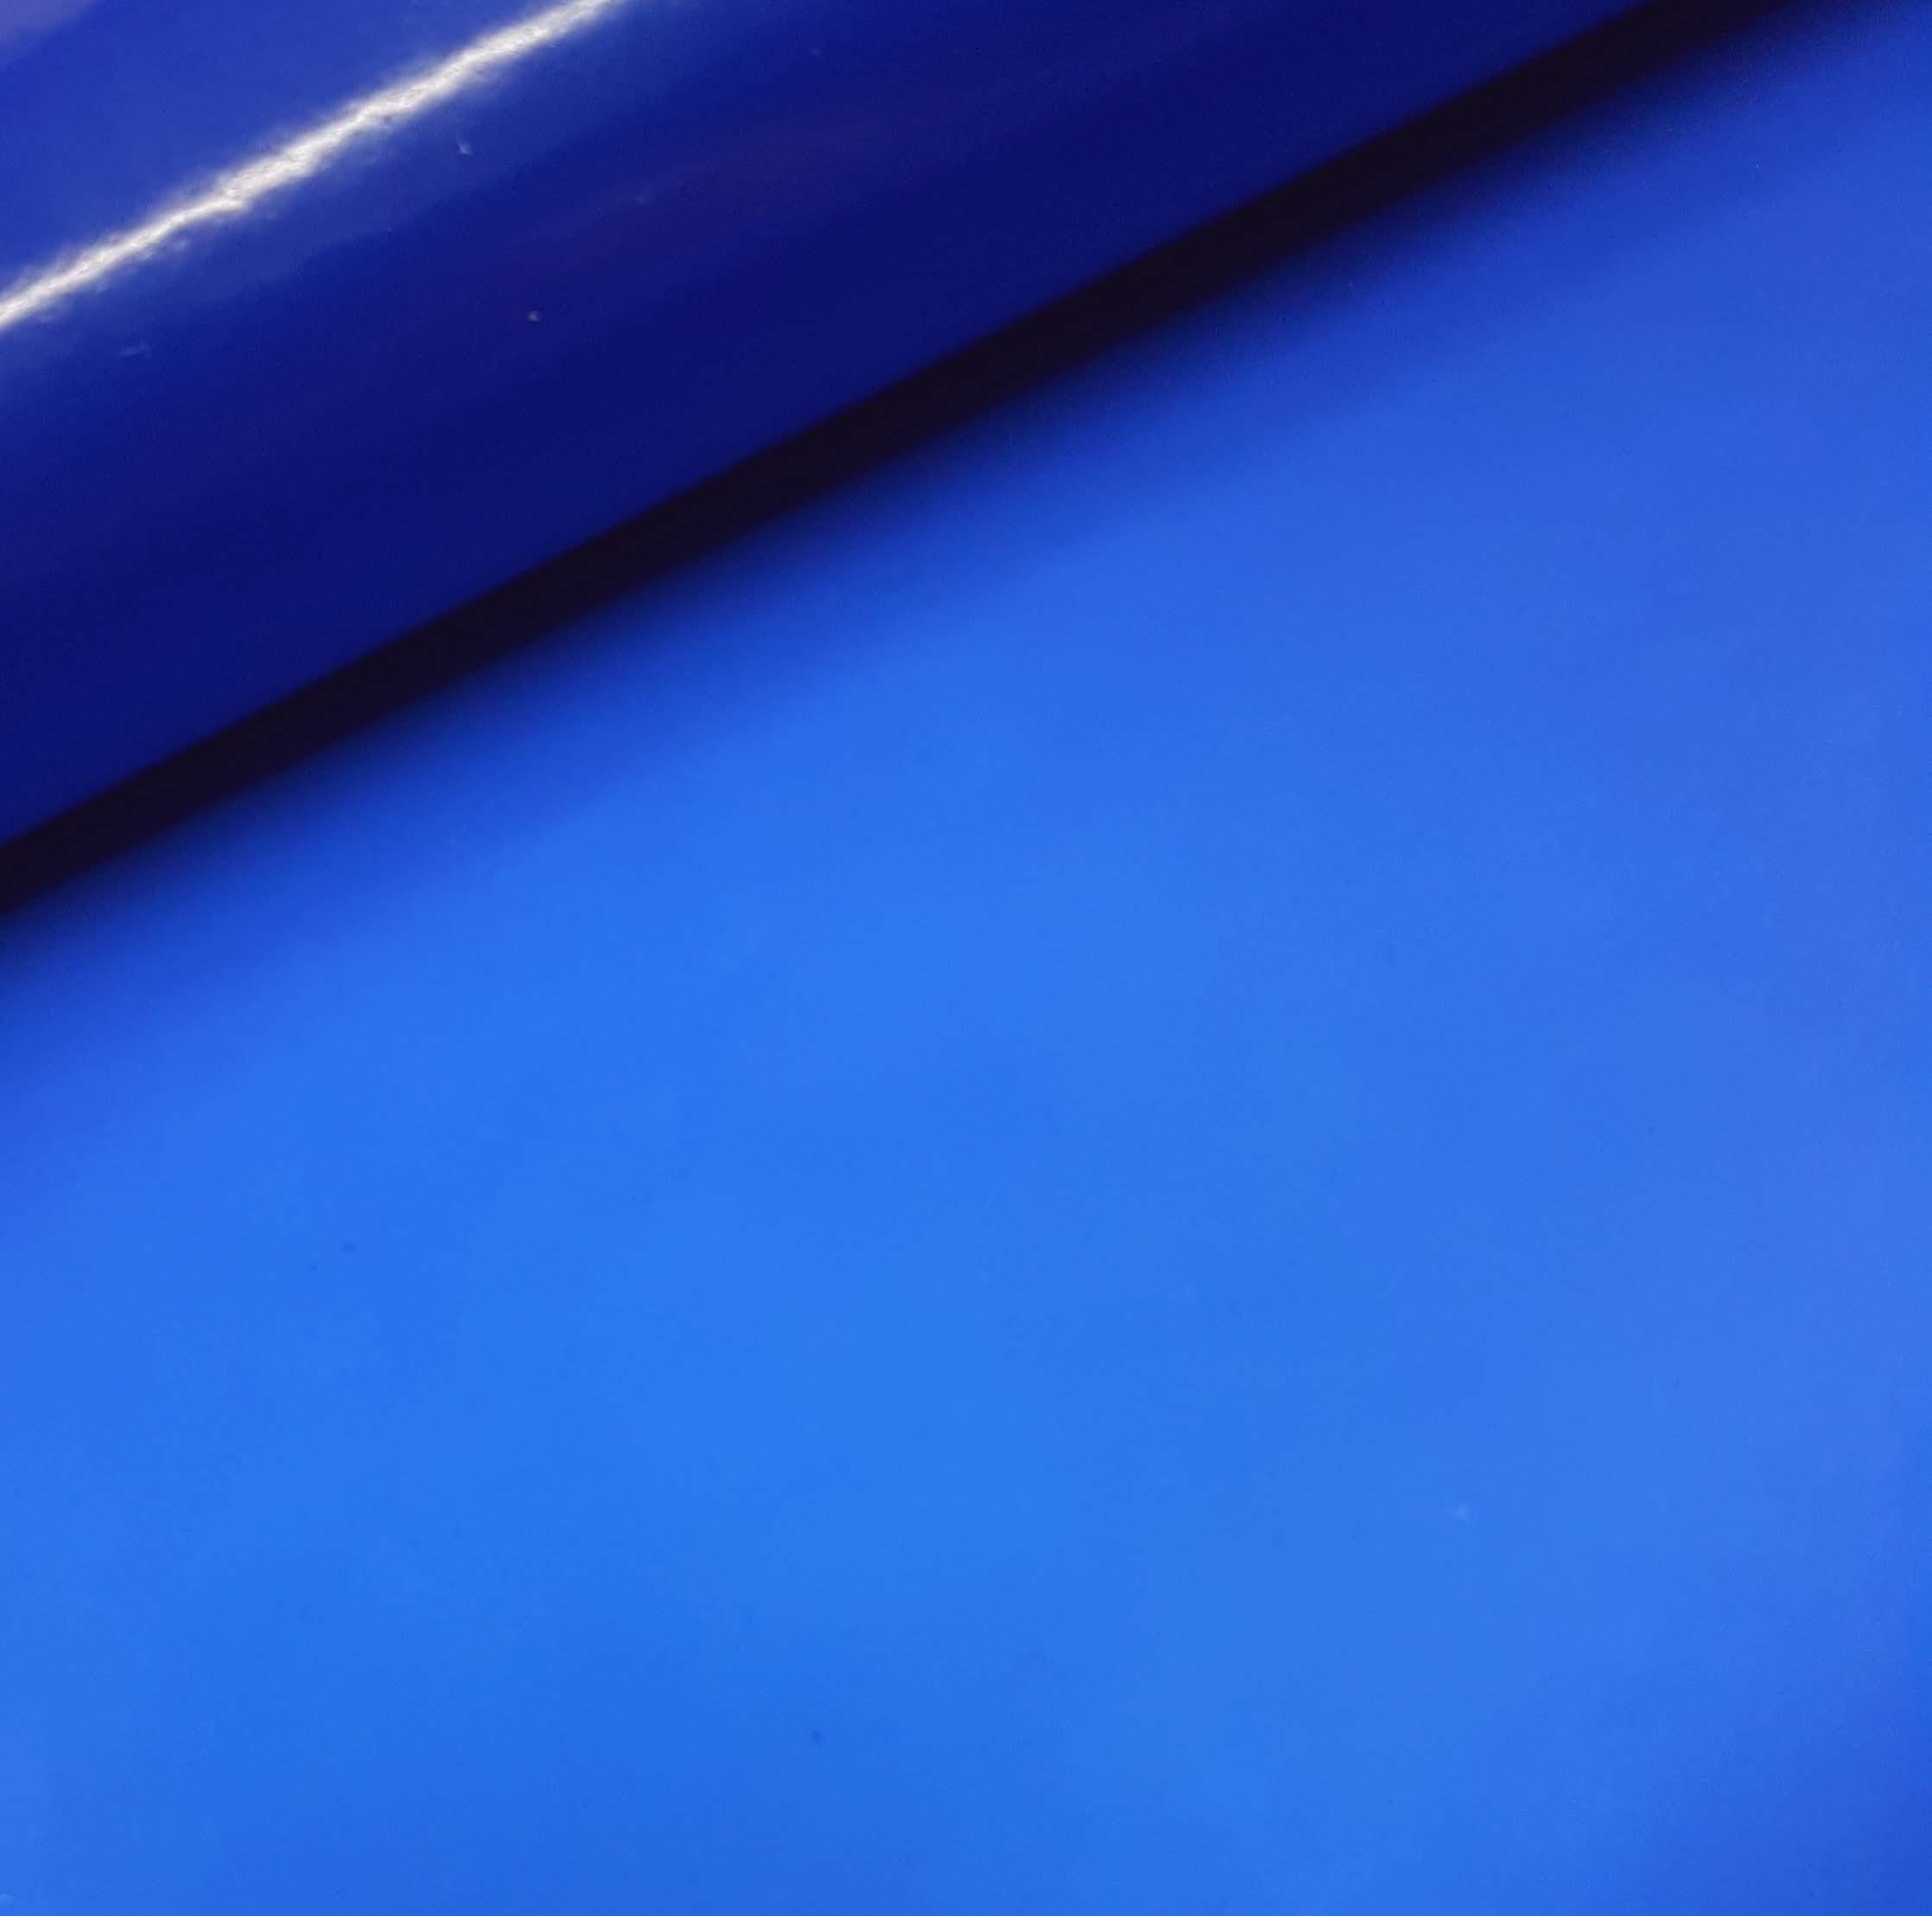 Sintético Silicone 0.7 - Azul Royal